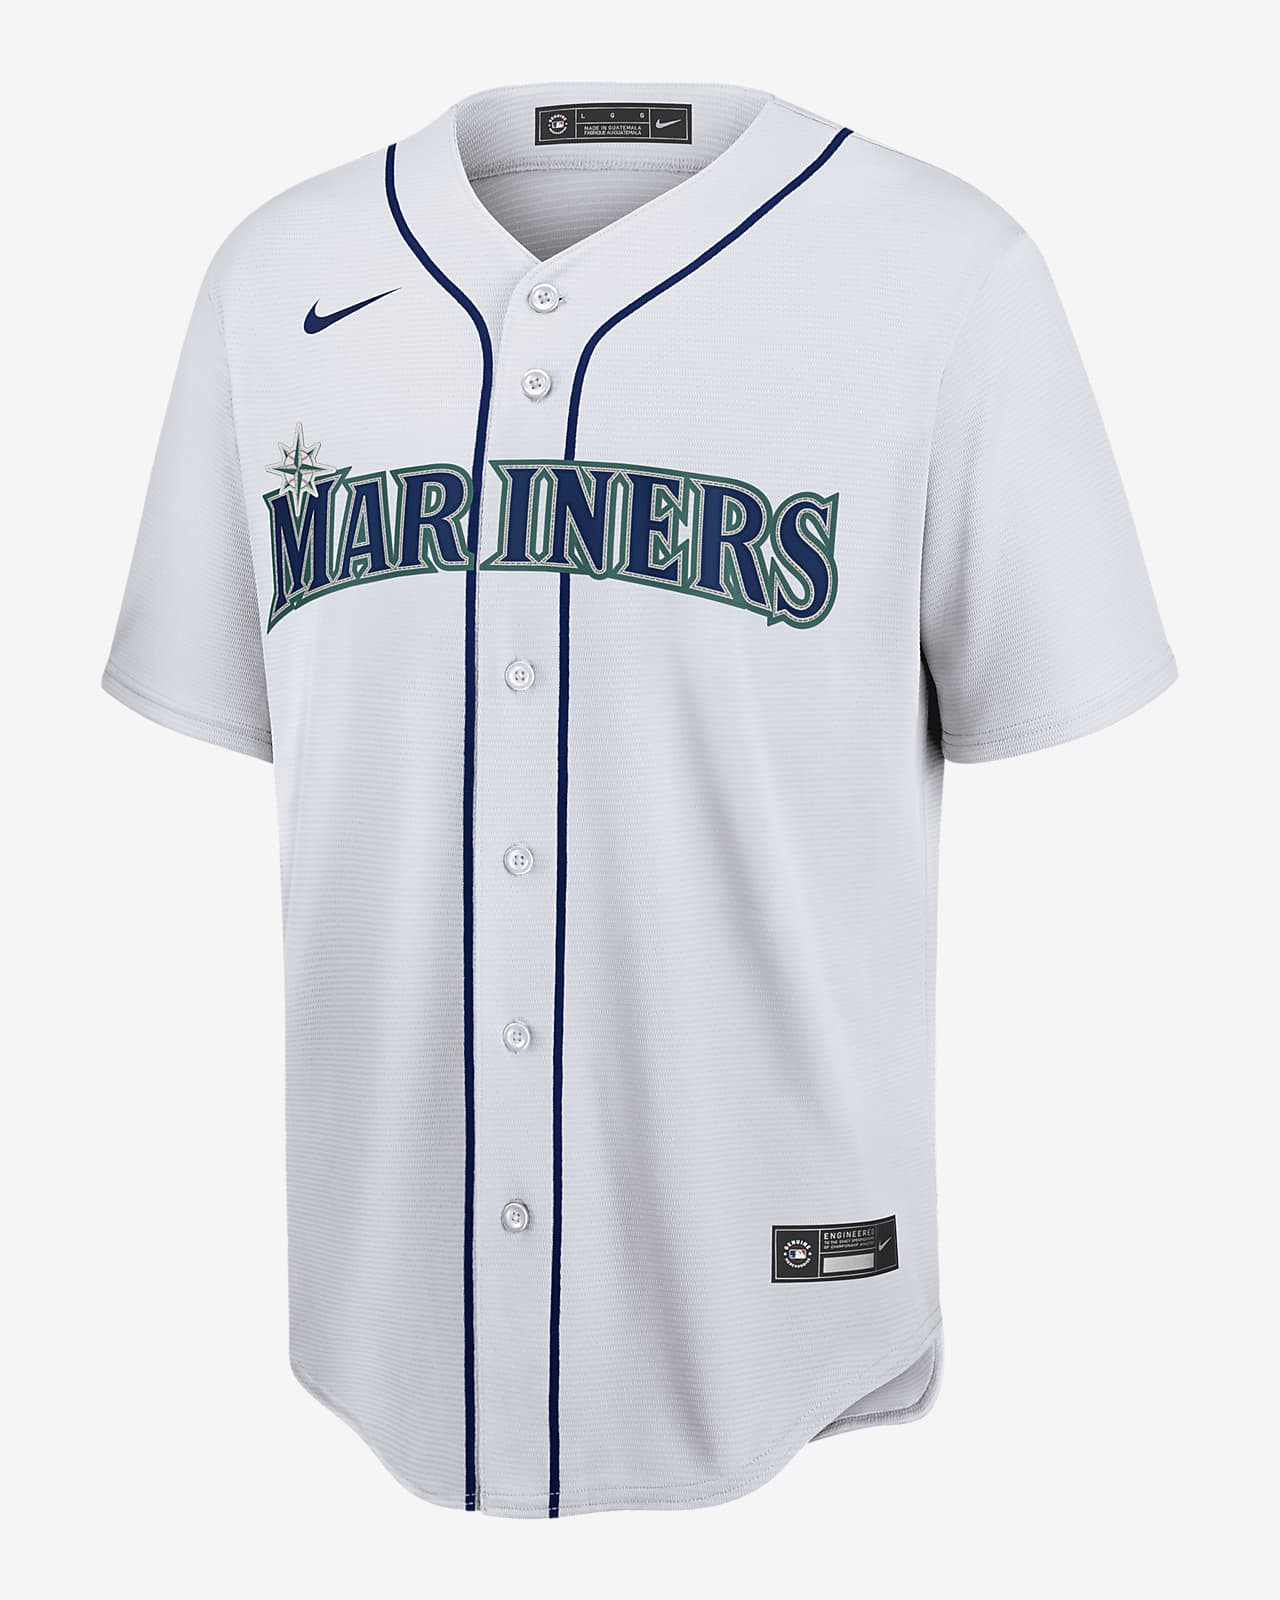 MLB Seattle Mariners (Mitch Haniger) Men's Replica Baseball Jersey